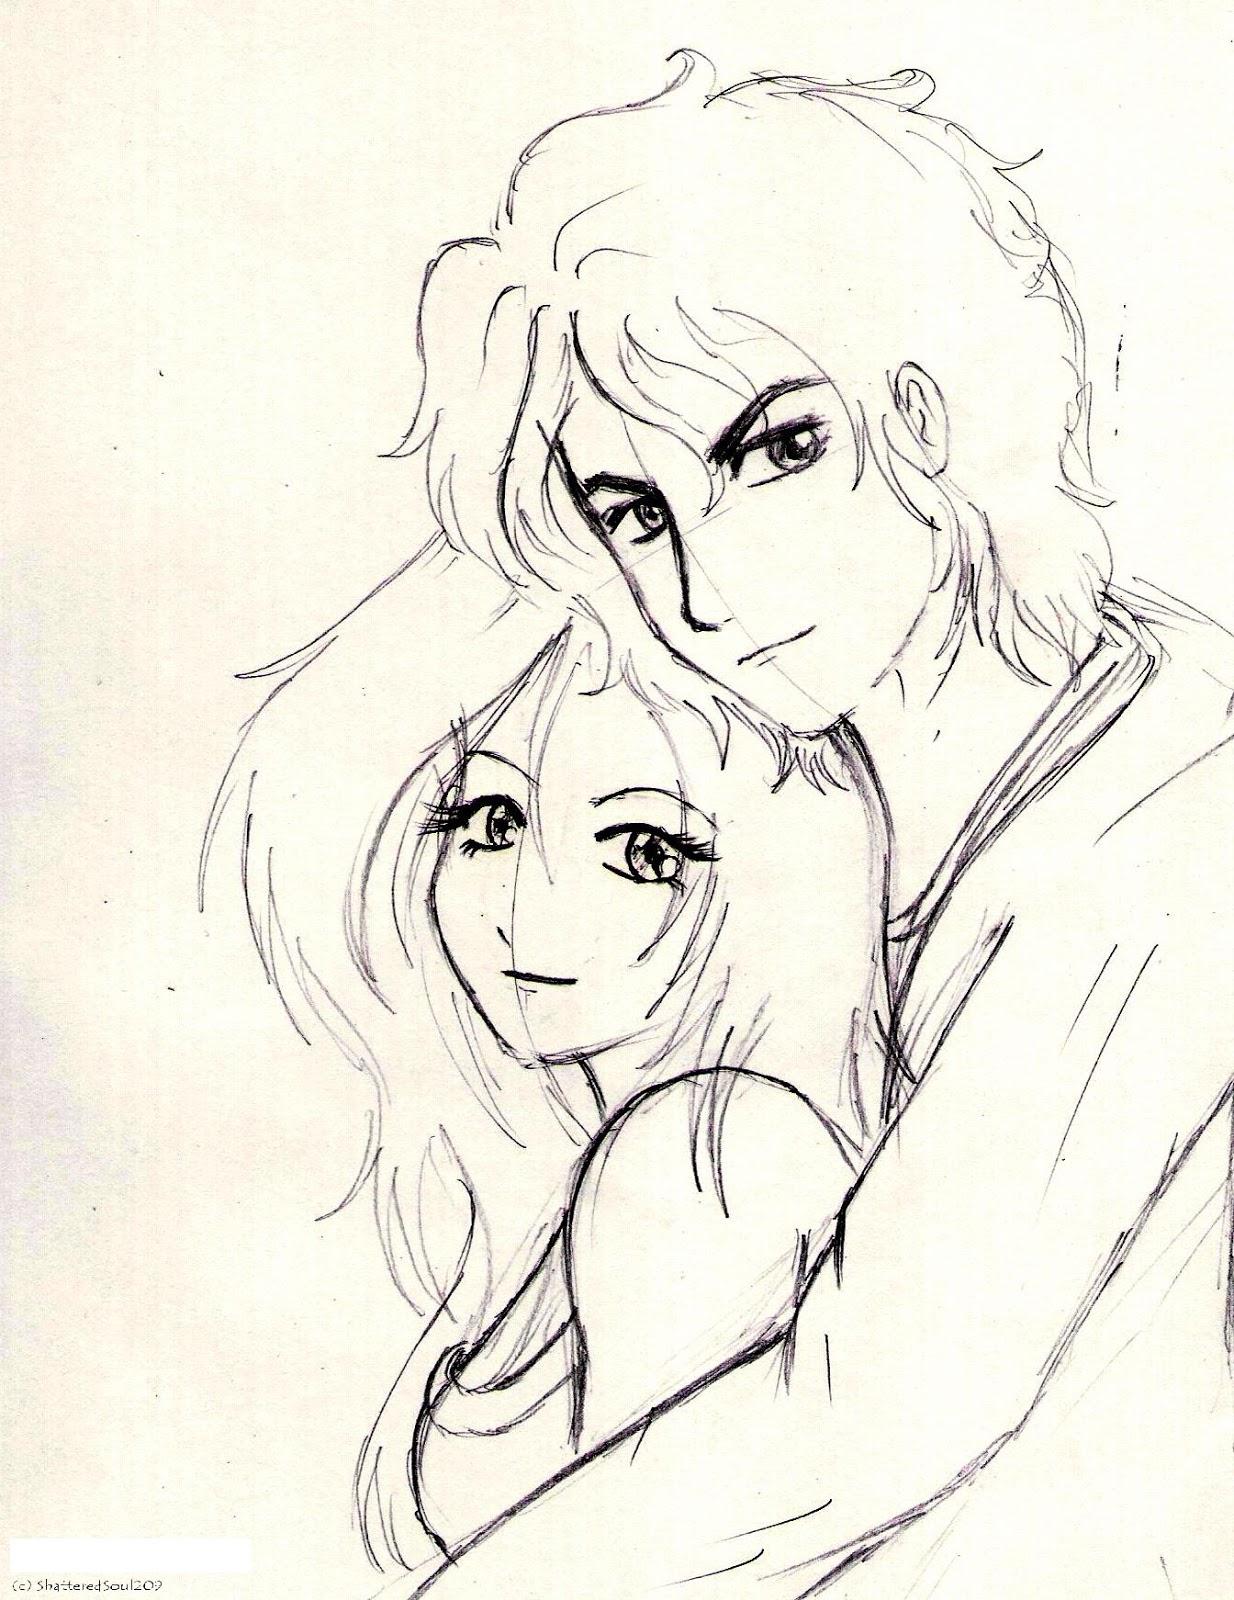 1234x1600 Pencil Sketch Love Wallpaper Hd Boy Girl Kissing Pencil Sketch Hd